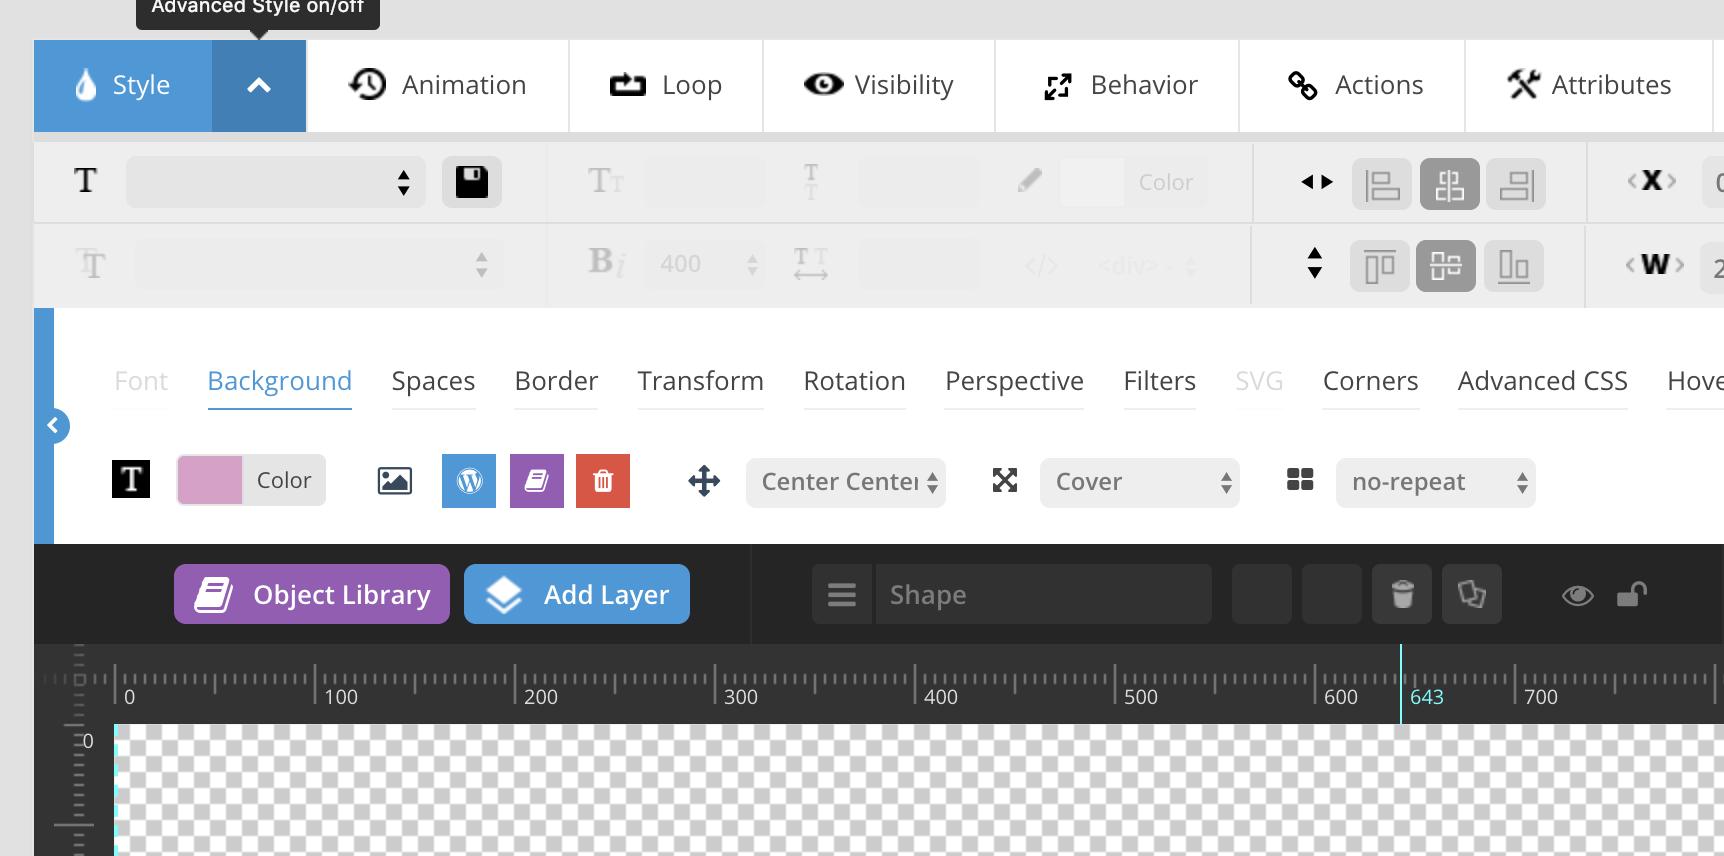 Slider Revolution - Edit+Shape - Support - Apex Forum